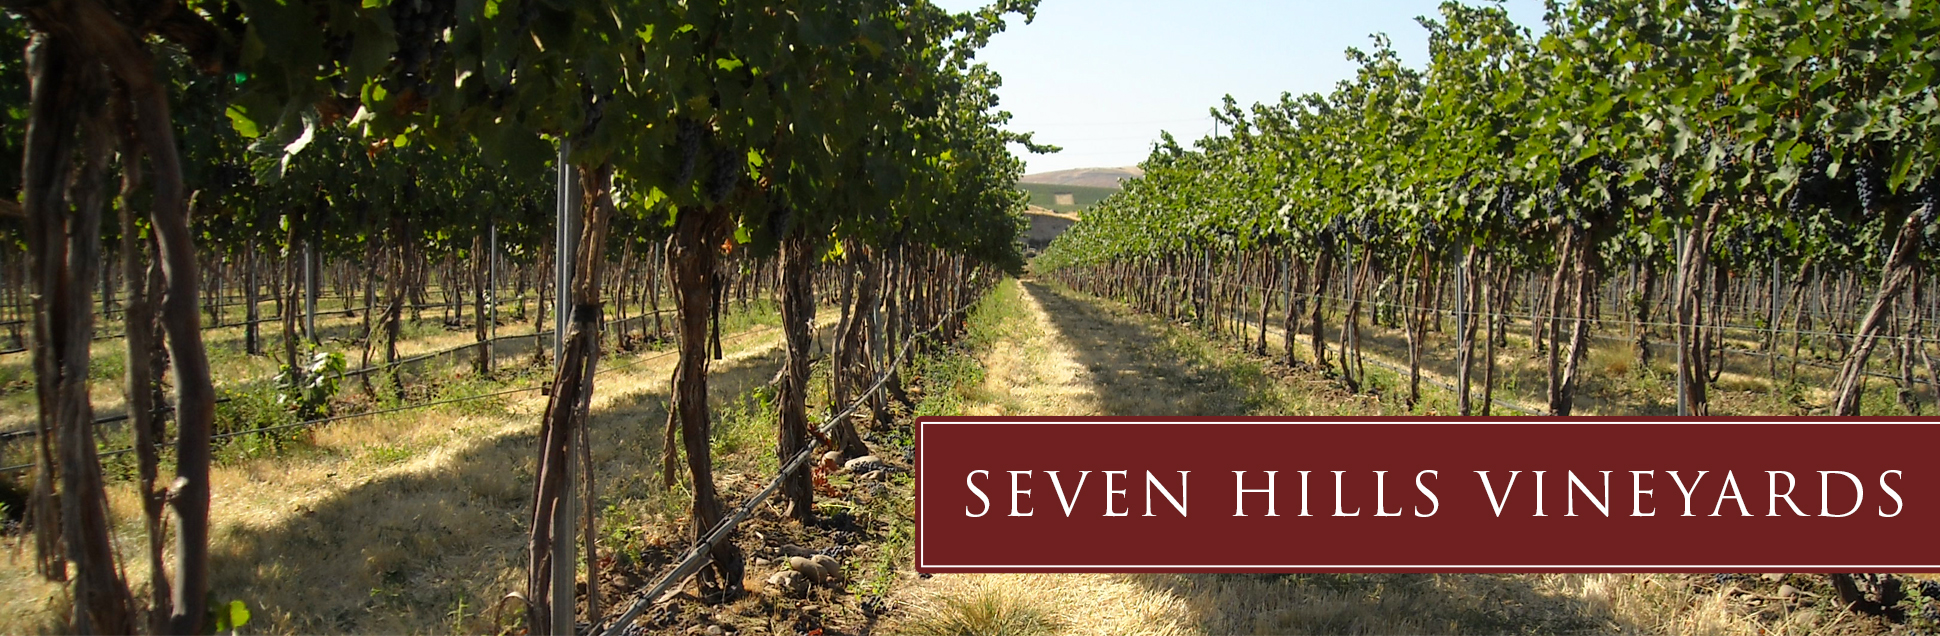 sh-vineyard-soil.jpg